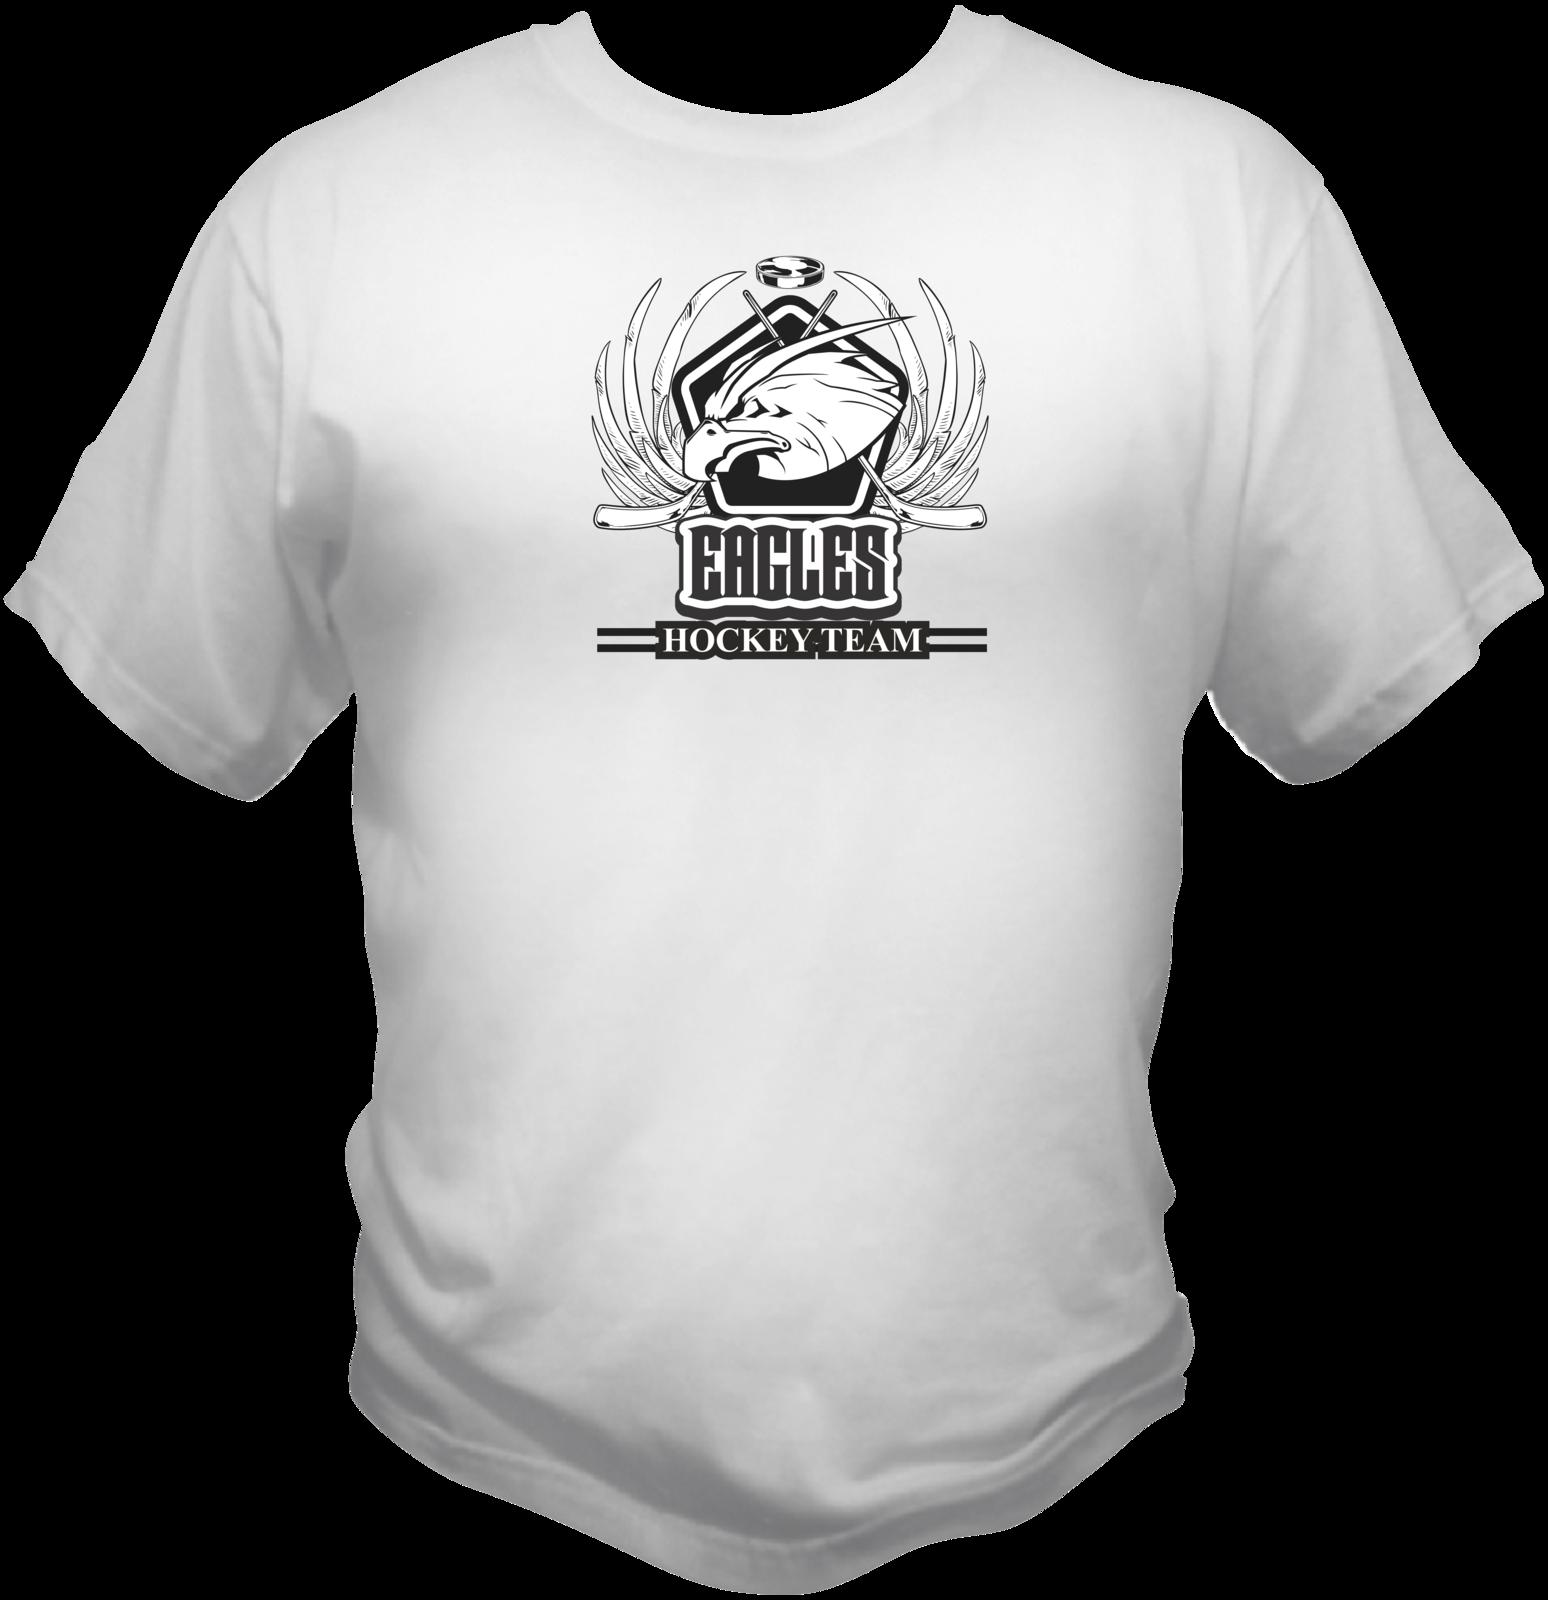 Eagles Hockey Team Sports Style Graphic T Shirt Black Red White L XL 2XL